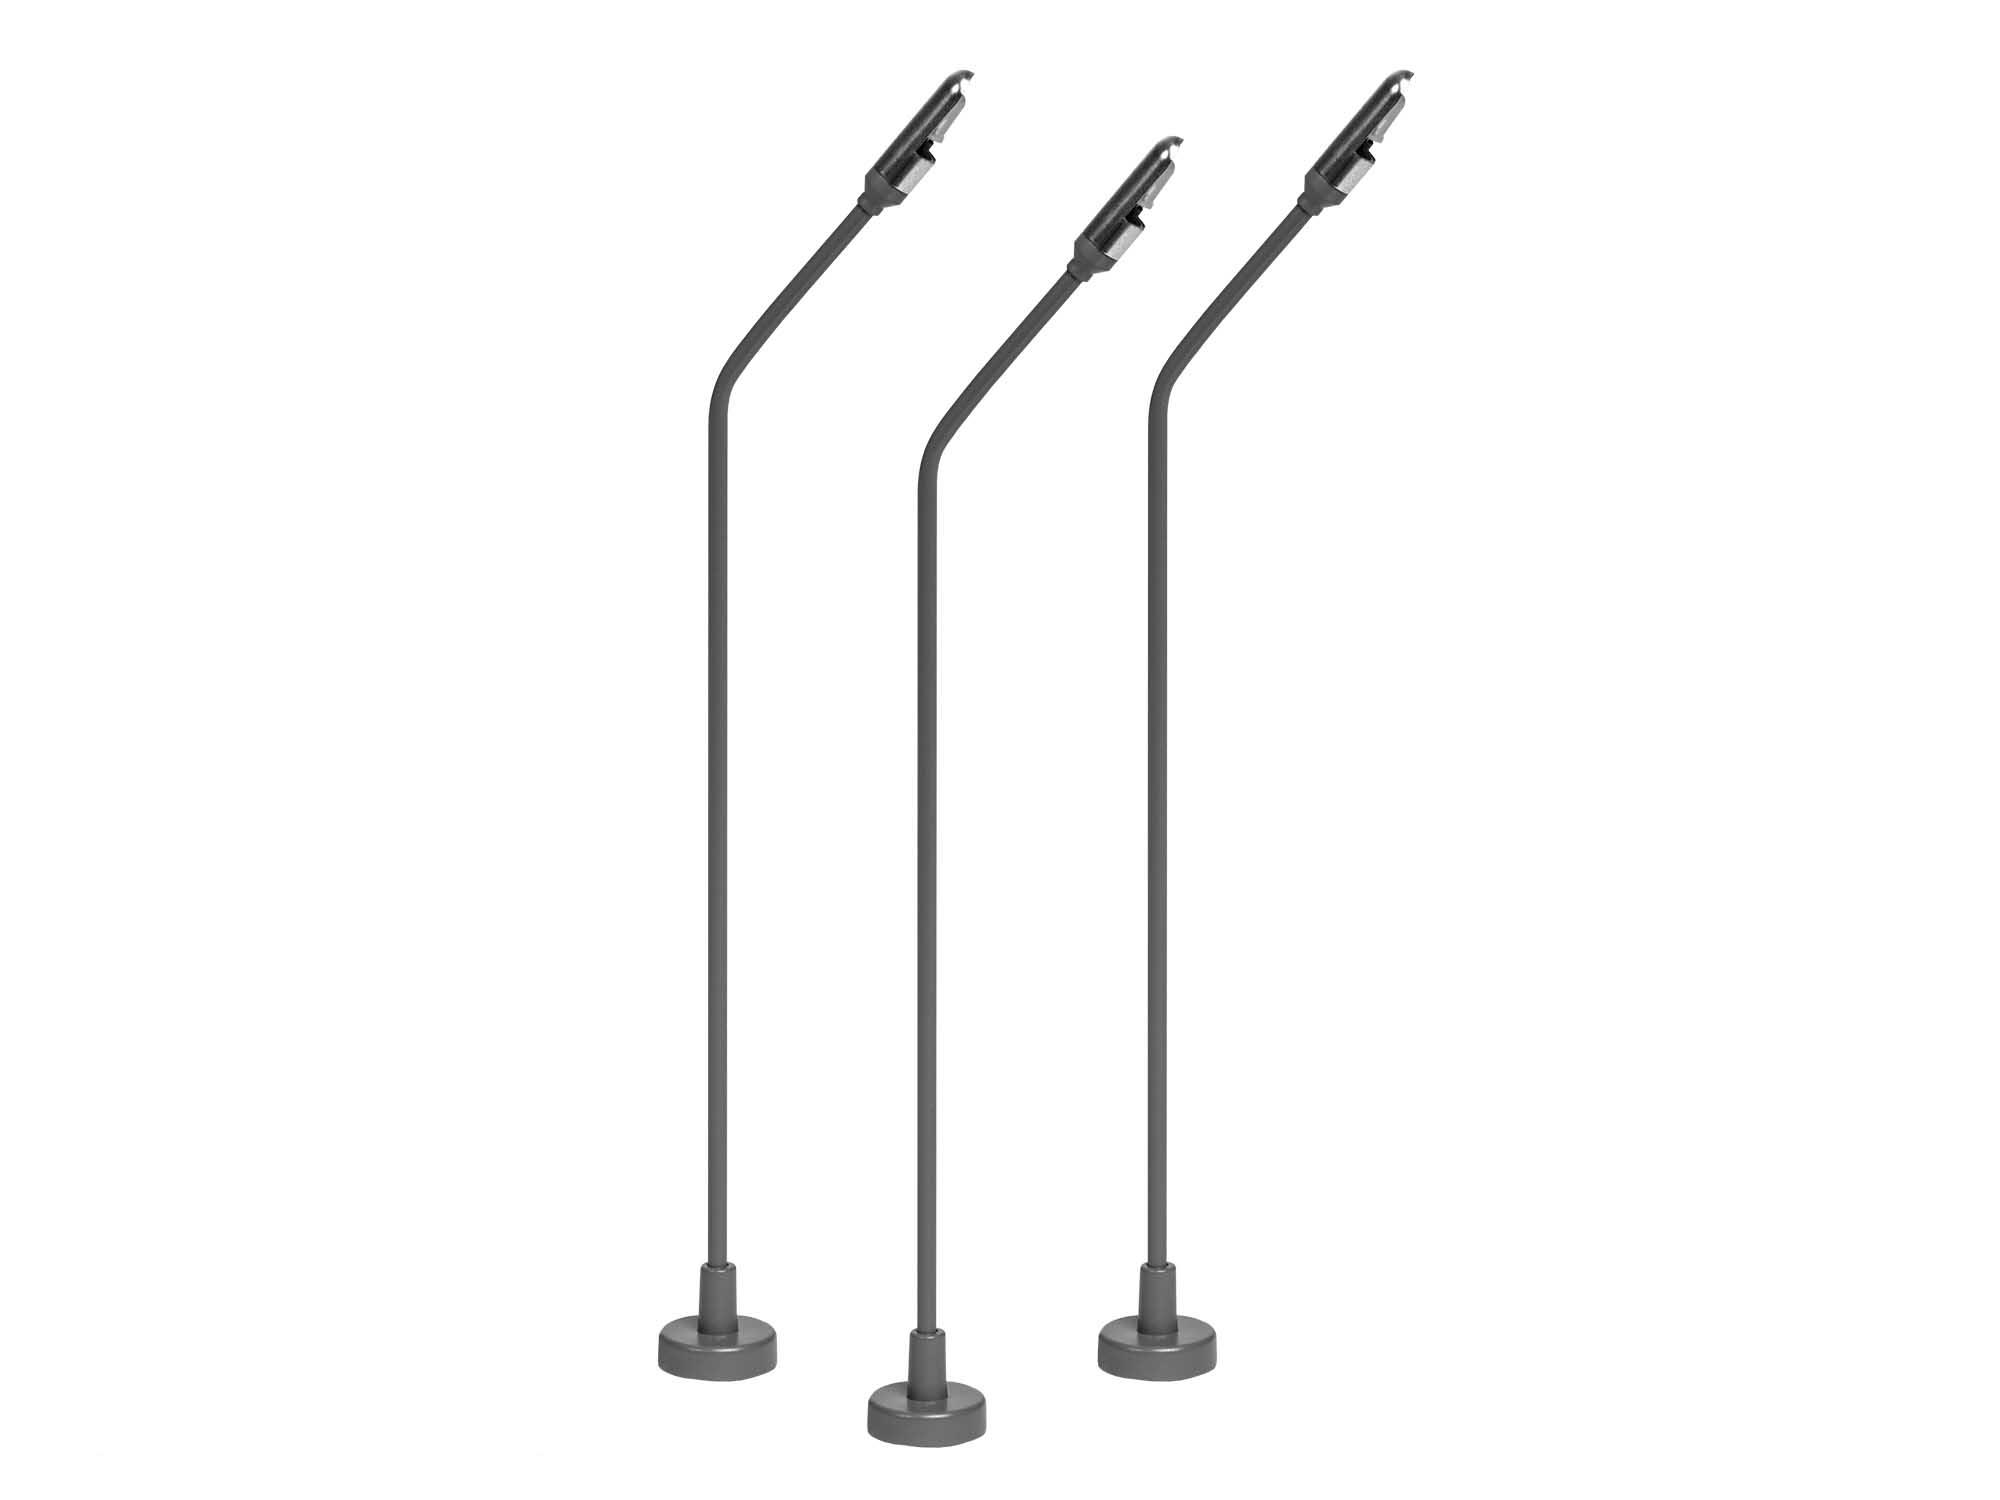 Lionel 2030220 Highway Lamp Single 3-Pack #6081